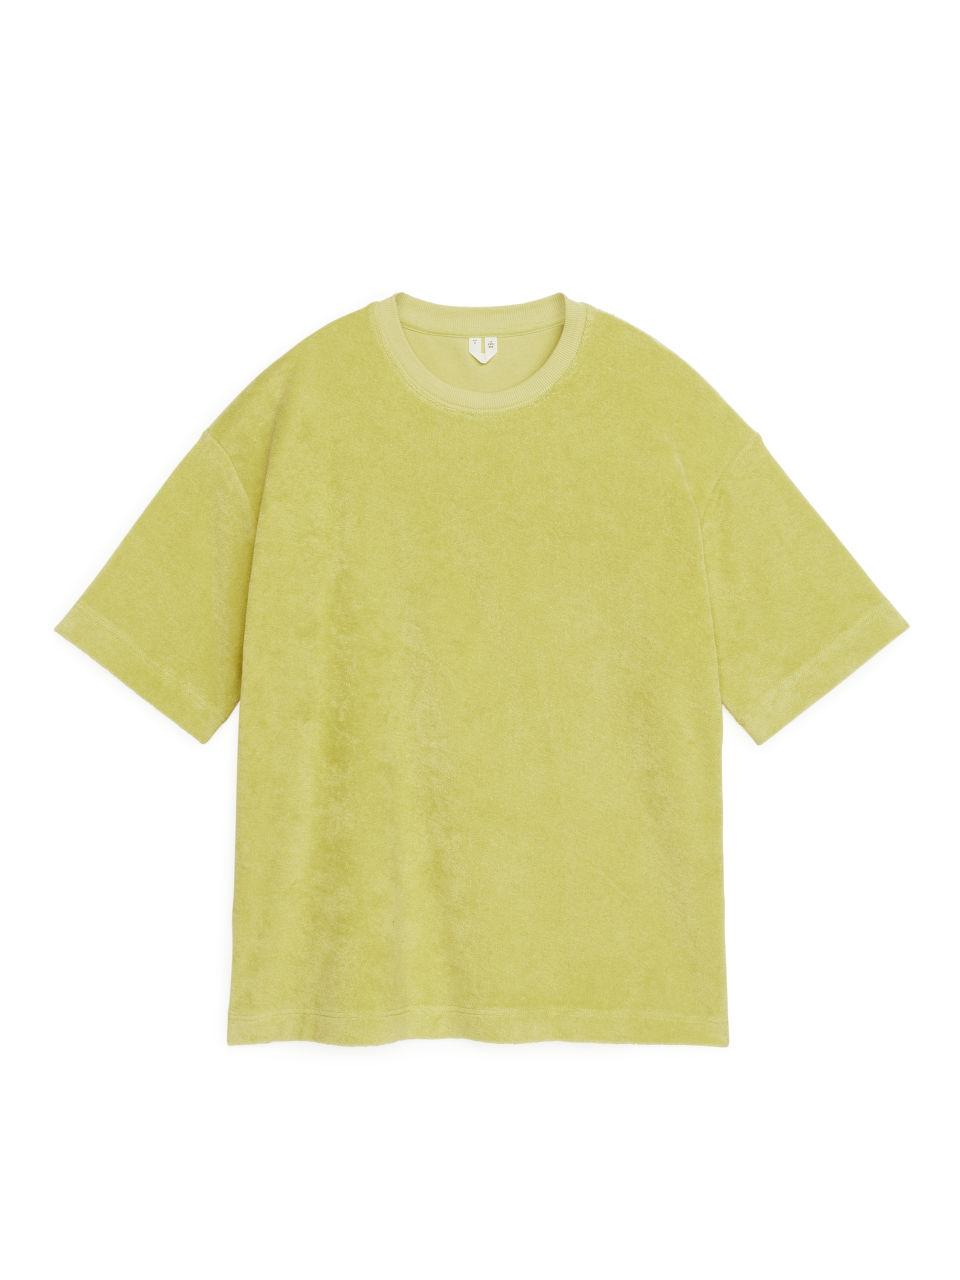 Oversized Towelling T-Shirt - Yellow